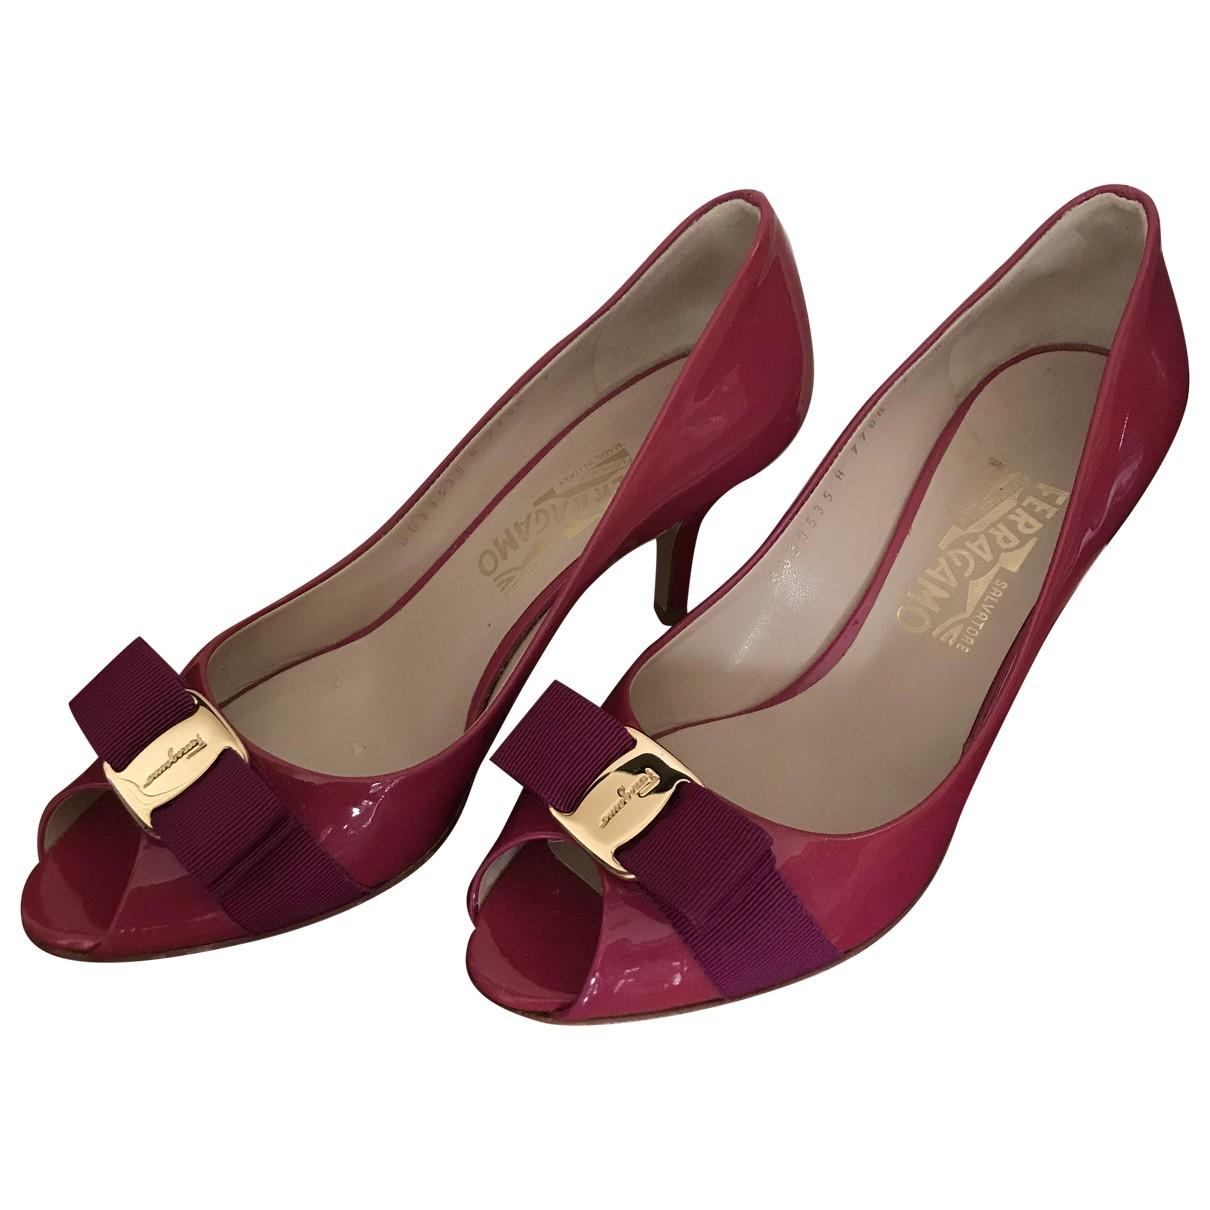 Salvatore Ferragamo \N Pink Patent leather Heels for Women 7 US